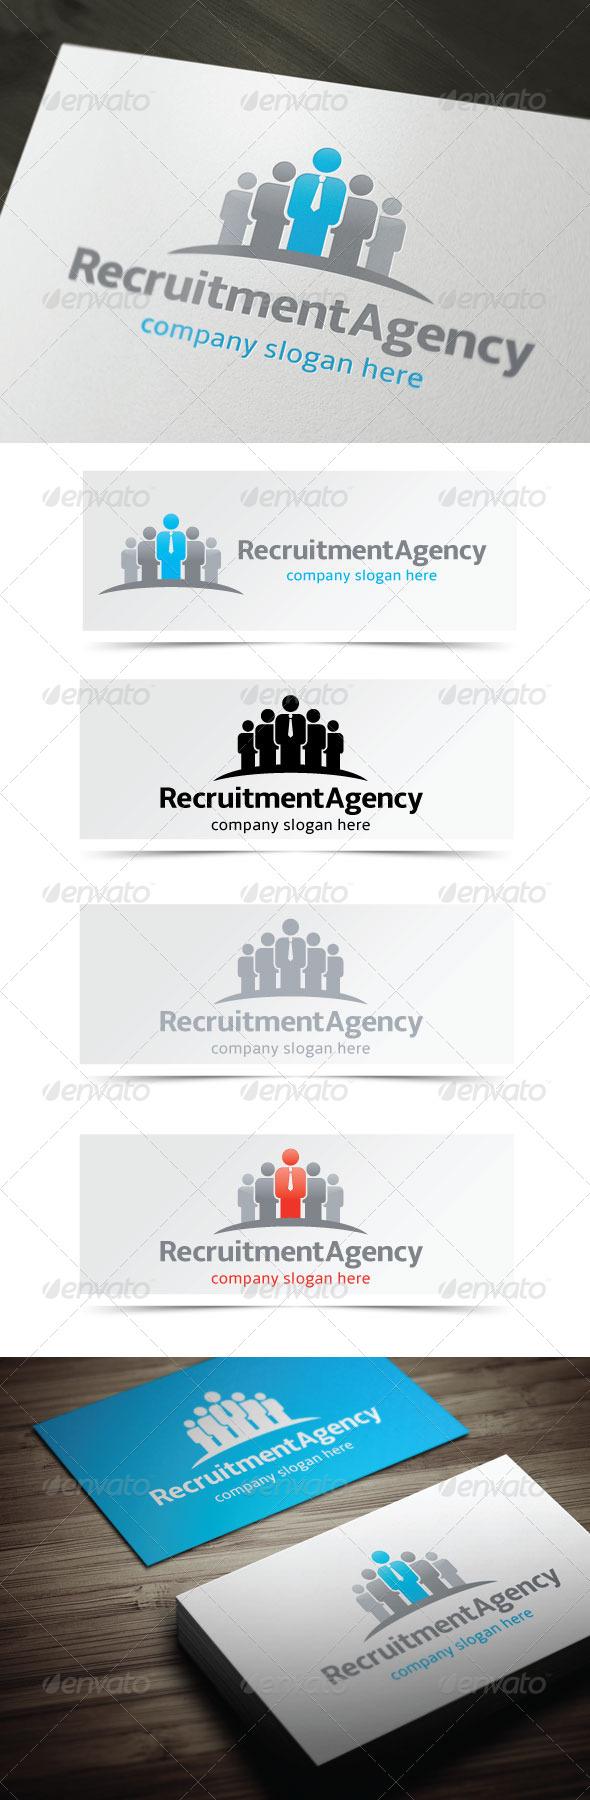 GraphicRiver Recruitment Agency 4588101